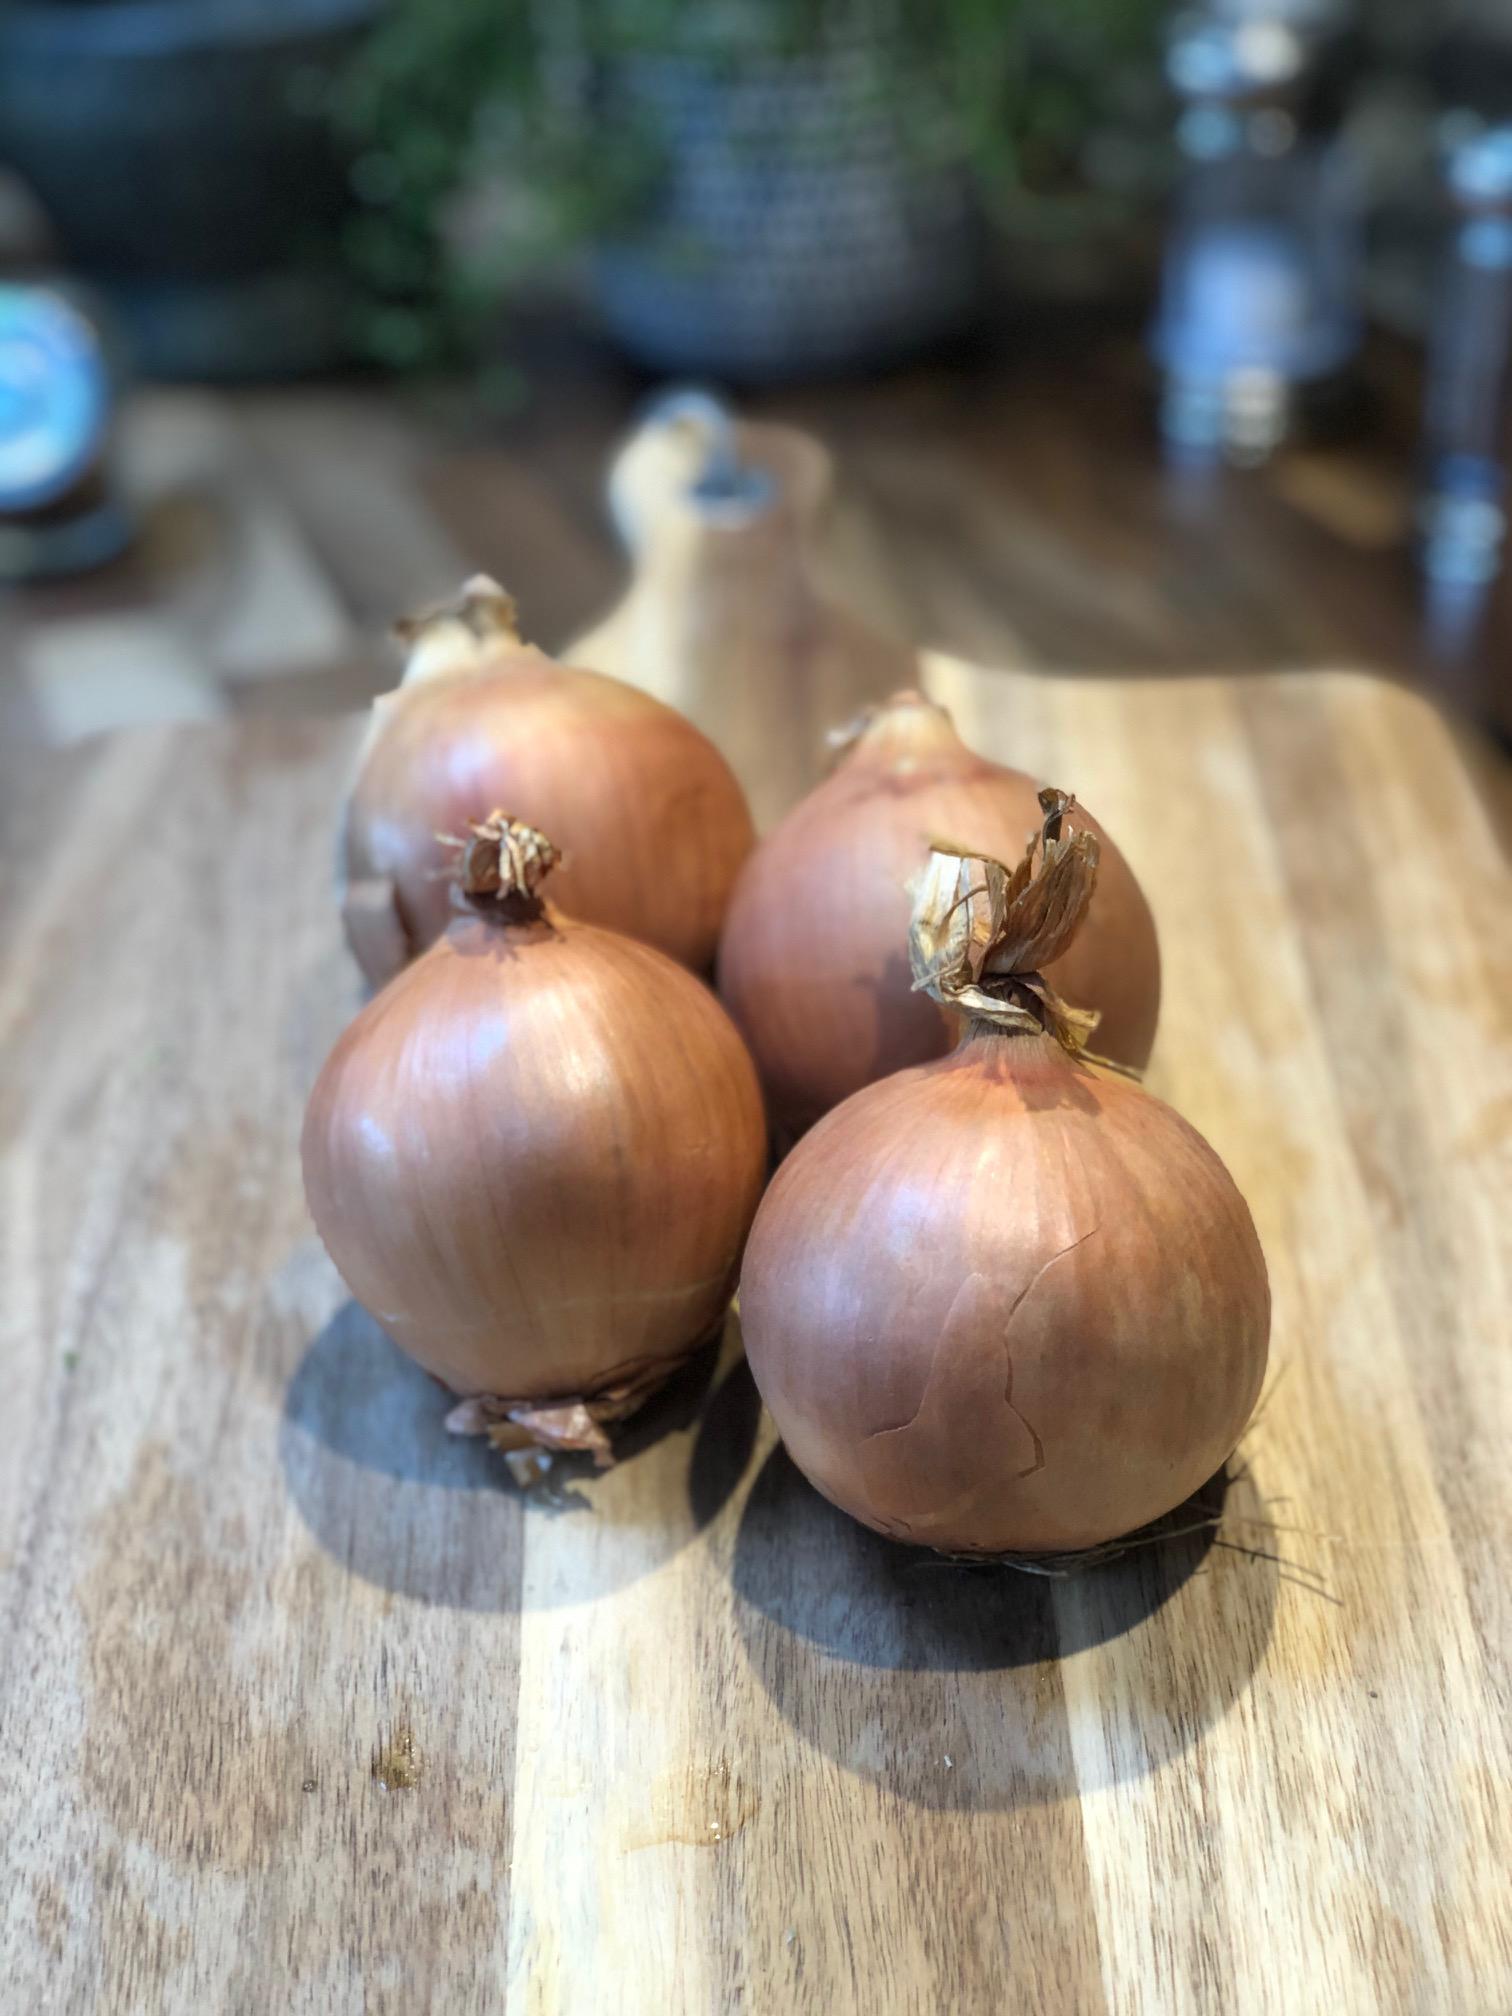 Veg - Onions